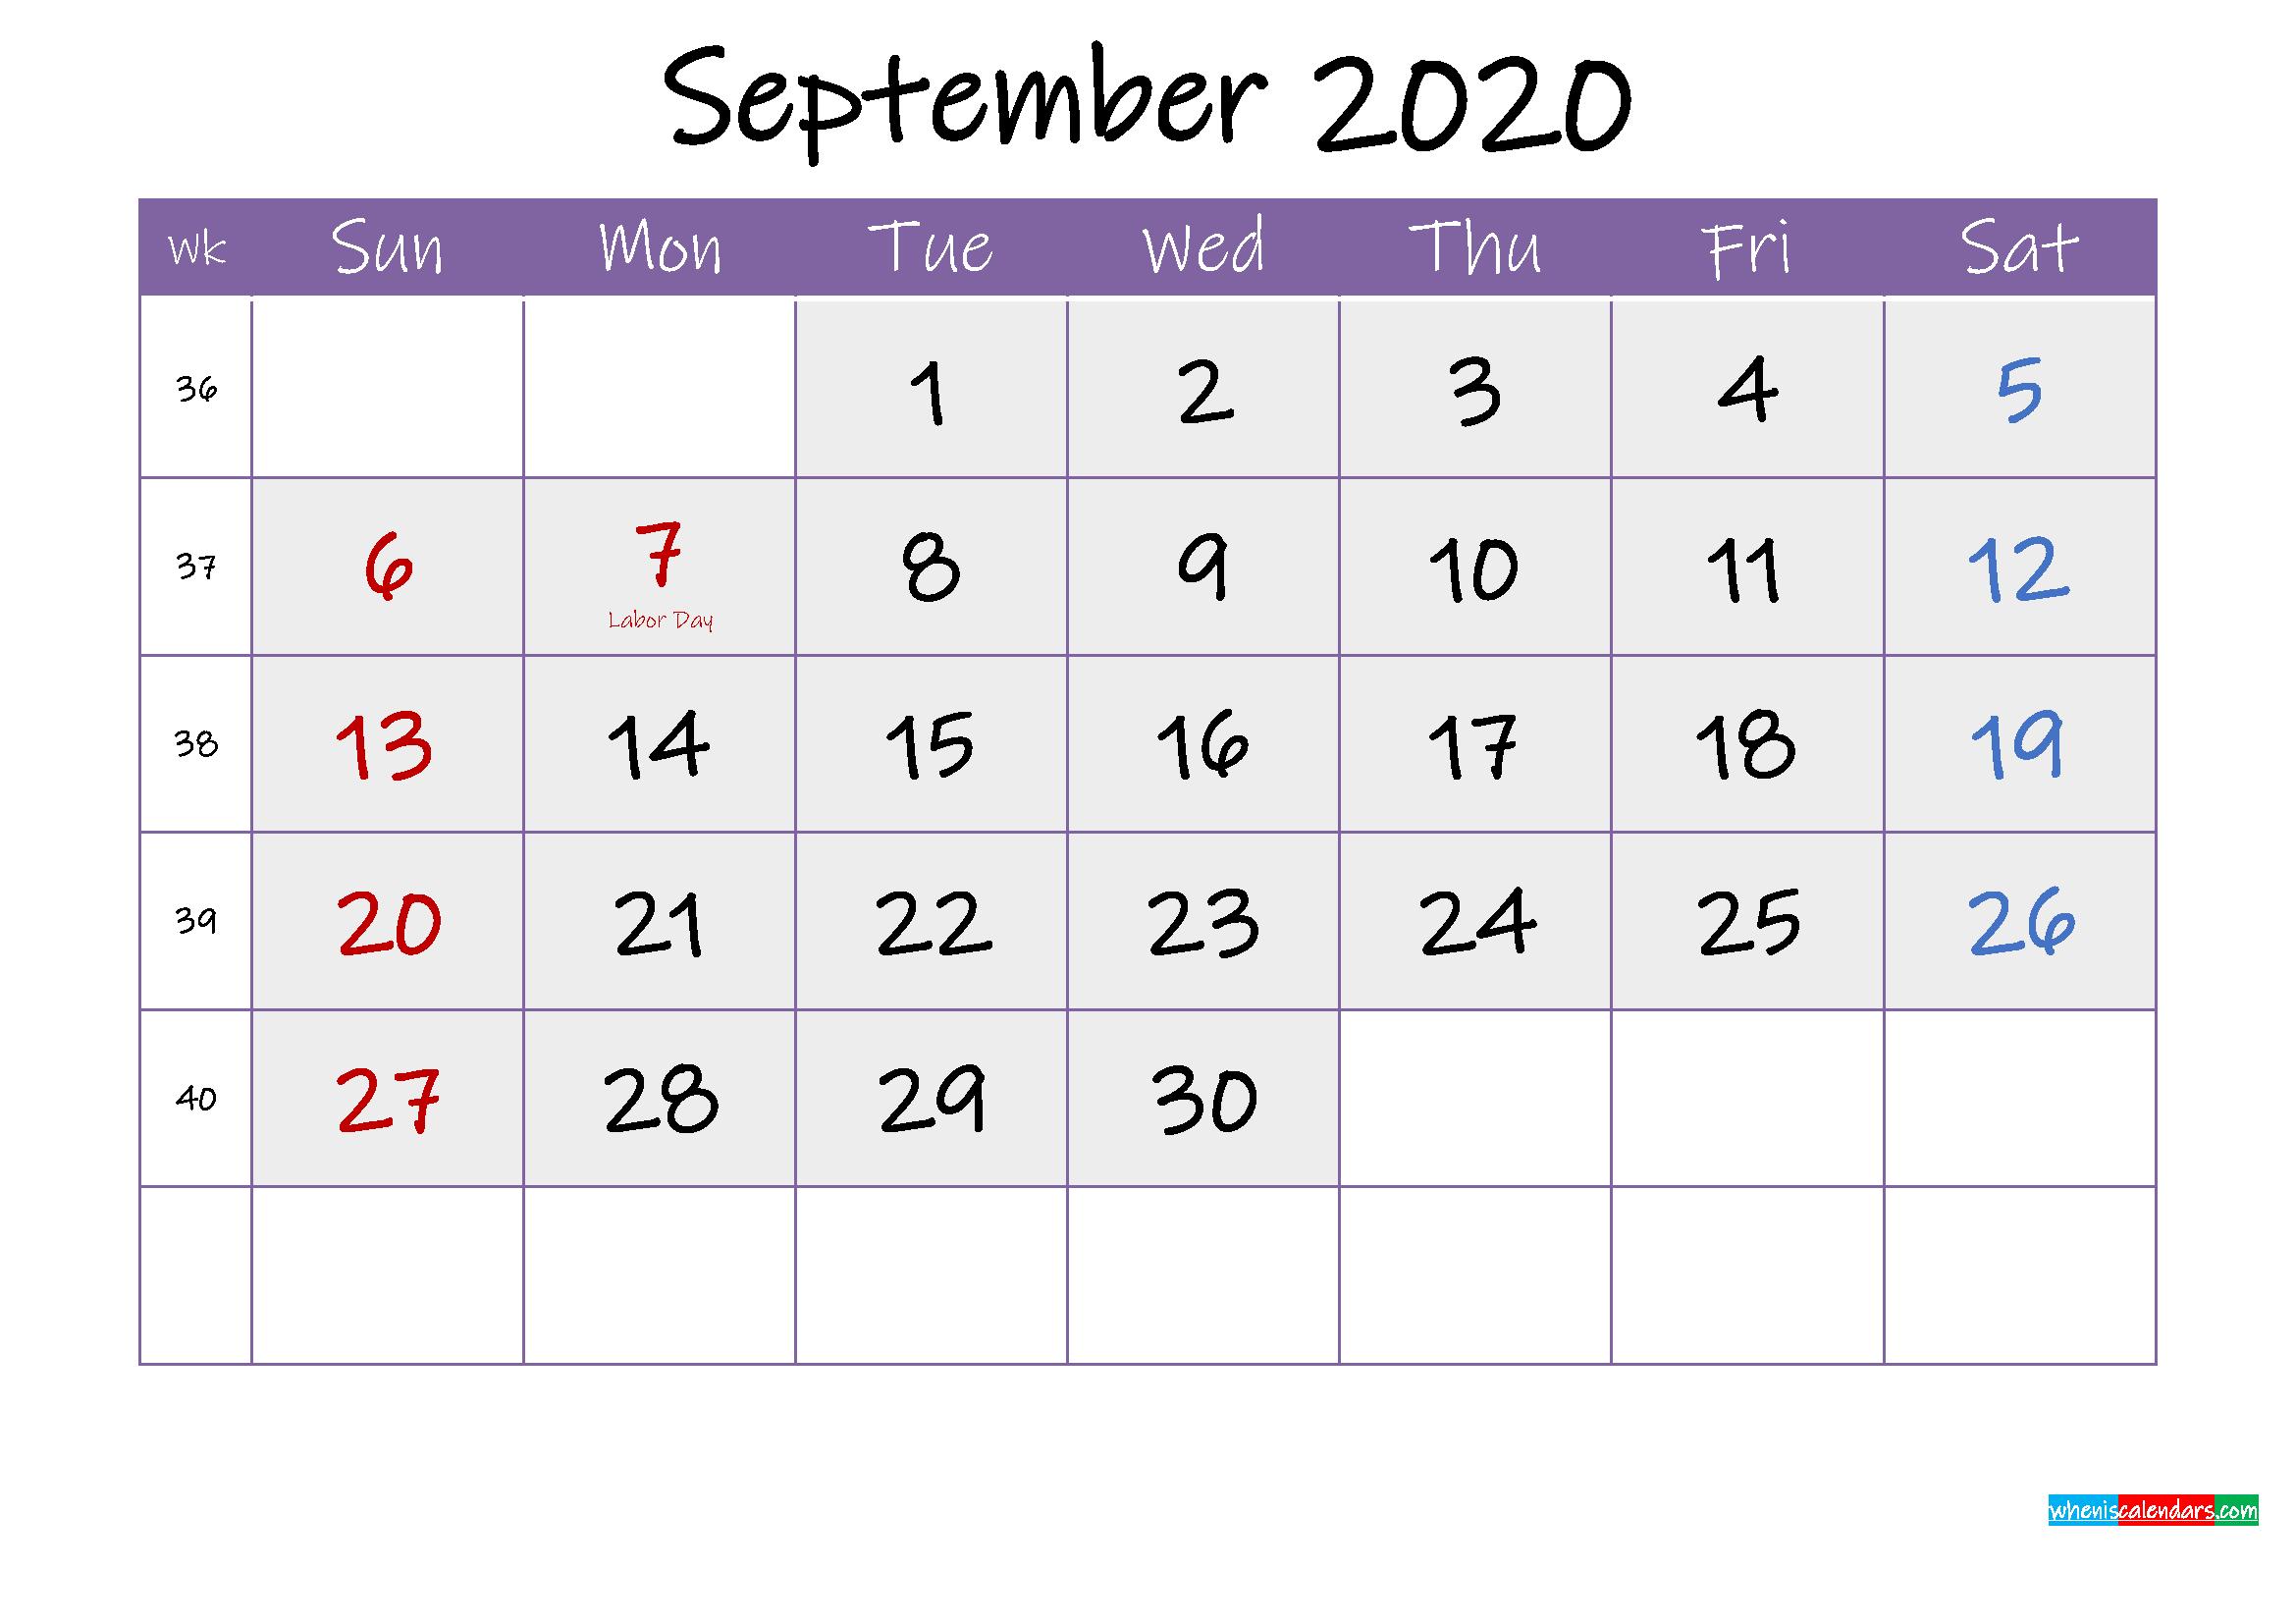 Free September 2020 Printable Calendar with Holidays